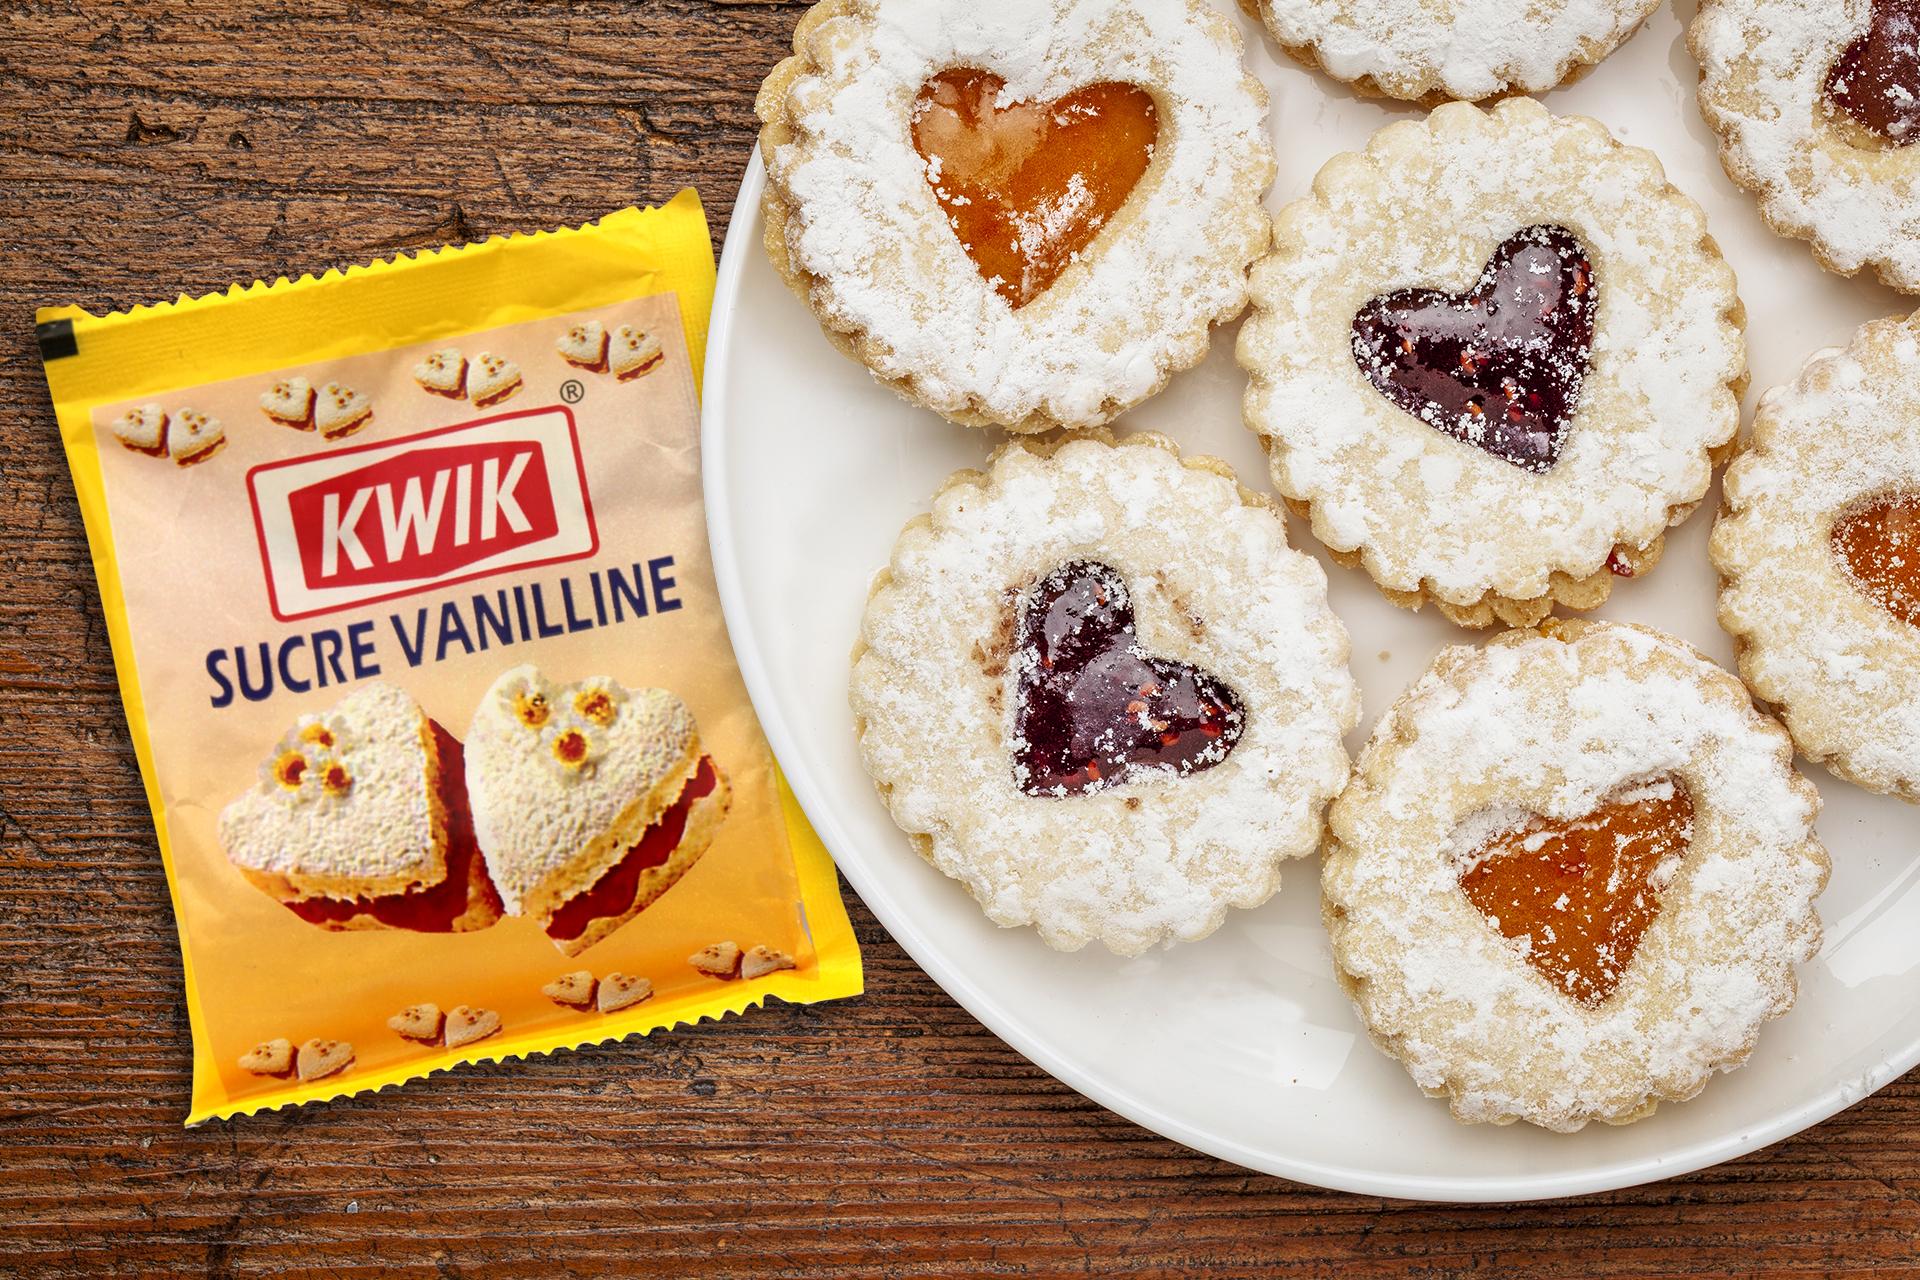 https://www.orbitsarl.com/wp-content/uploads/2017/08/Product-Cooking_Kwik-Sucre-Vanilline_1920x1280-FIN.jpg